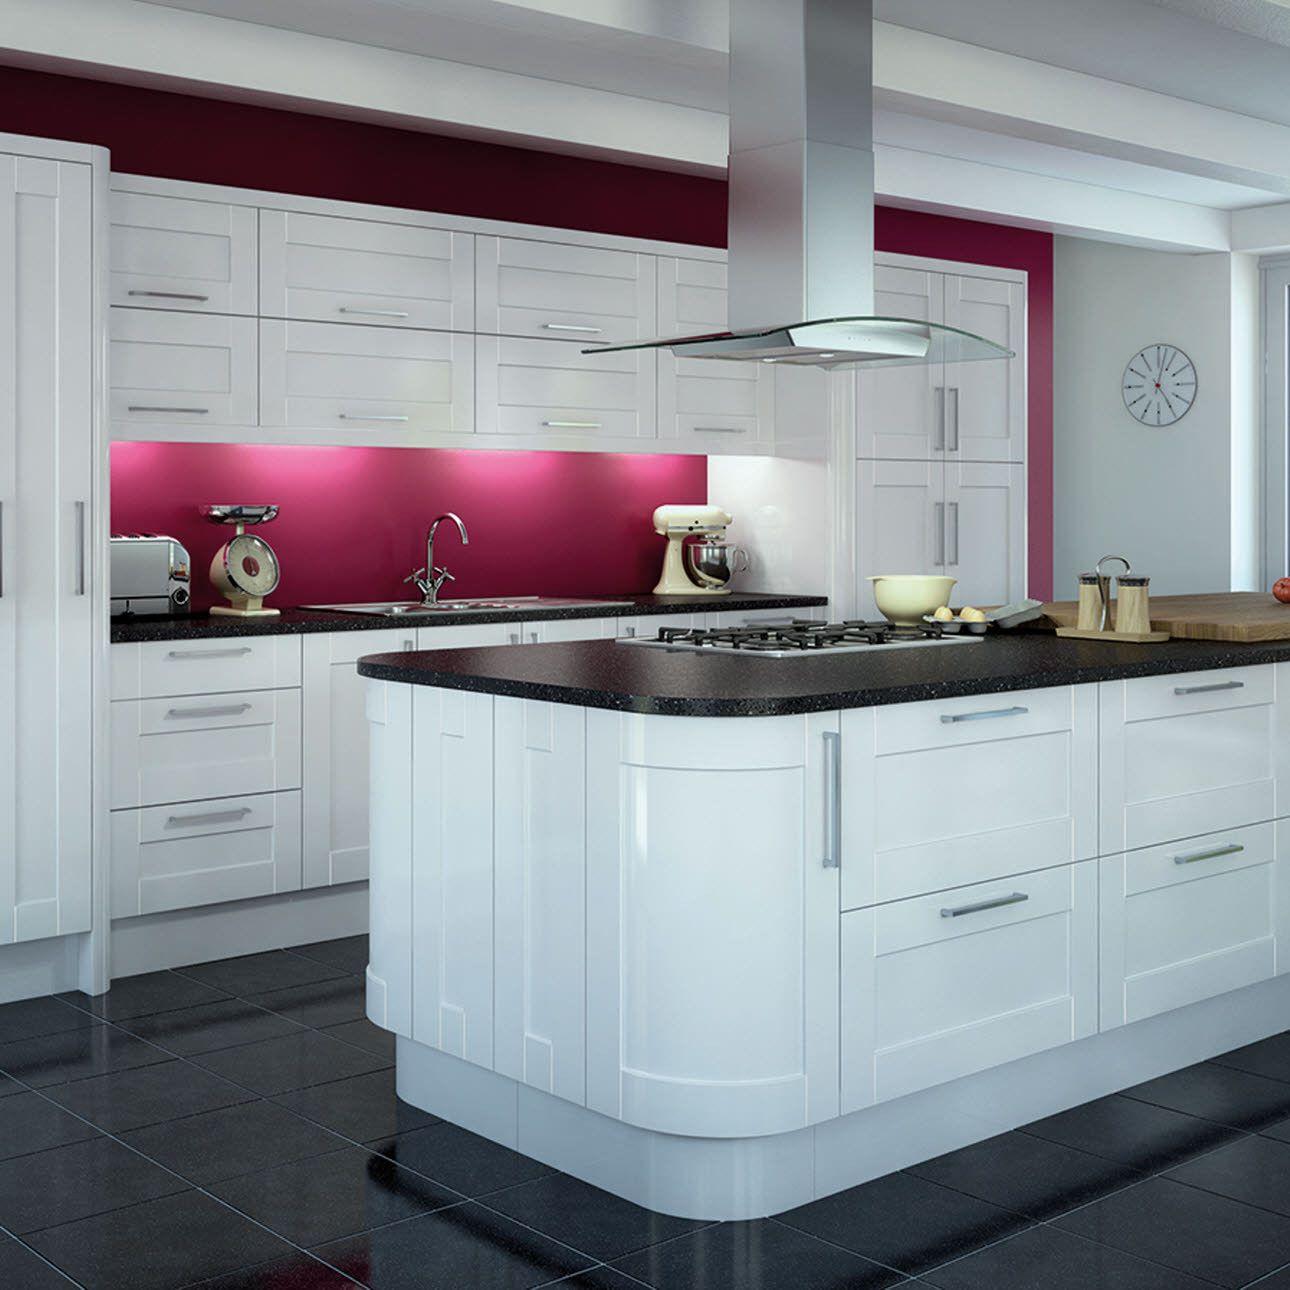 99+ Shiny White Kitchen Cabinets - Apartment Kitchen Cabinet Ideas ...